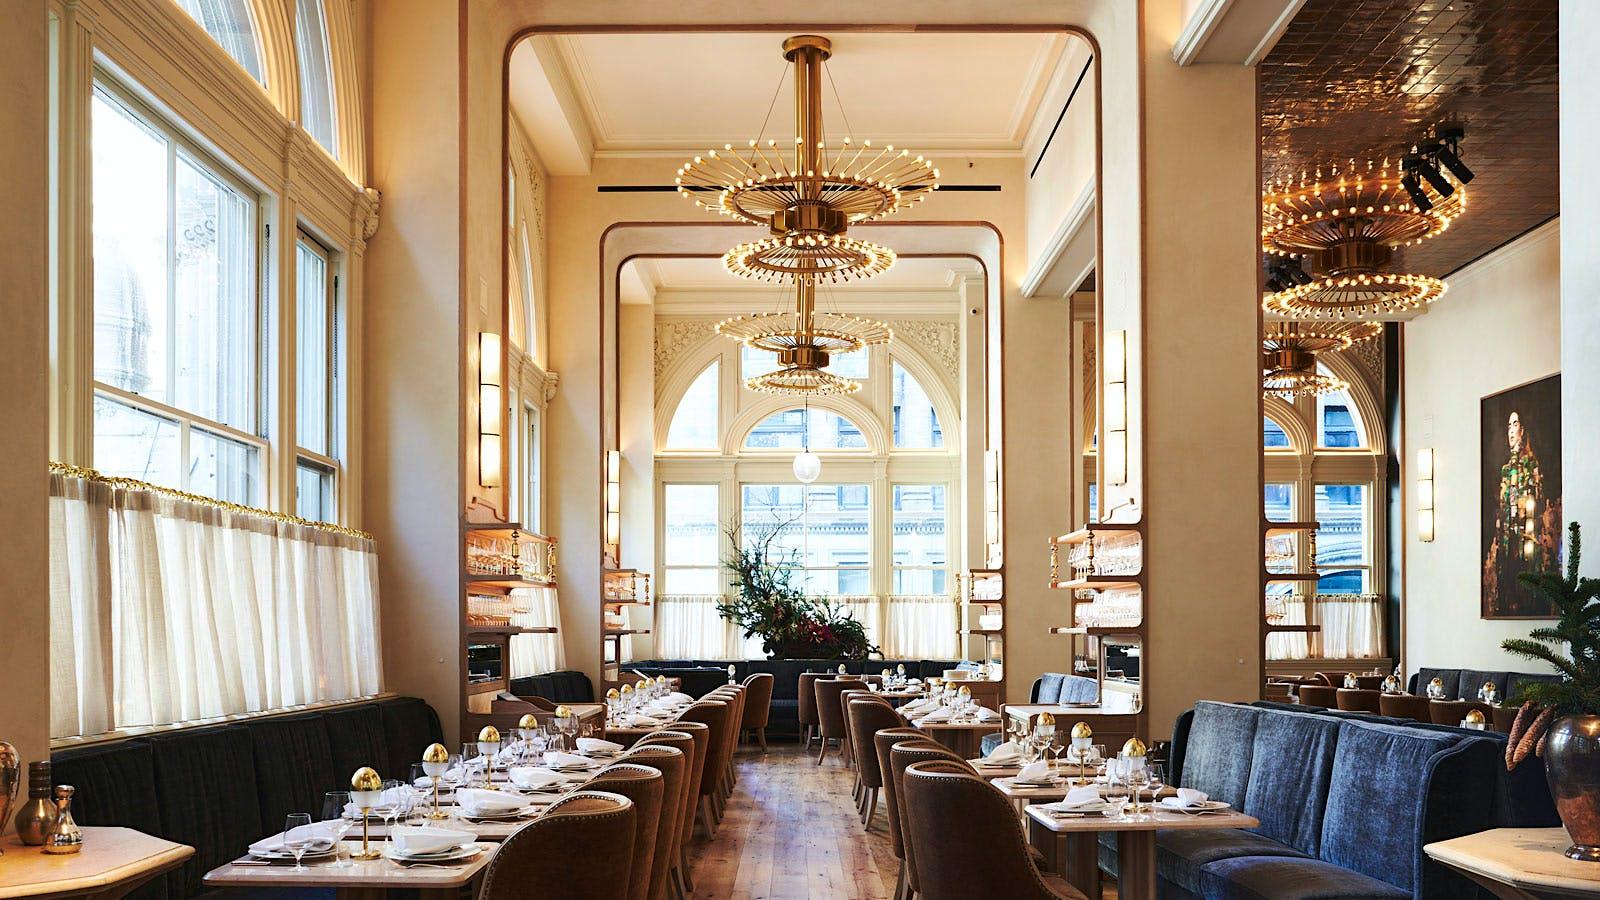 Stephen Starr's Transportive European Eatery Opens in New York